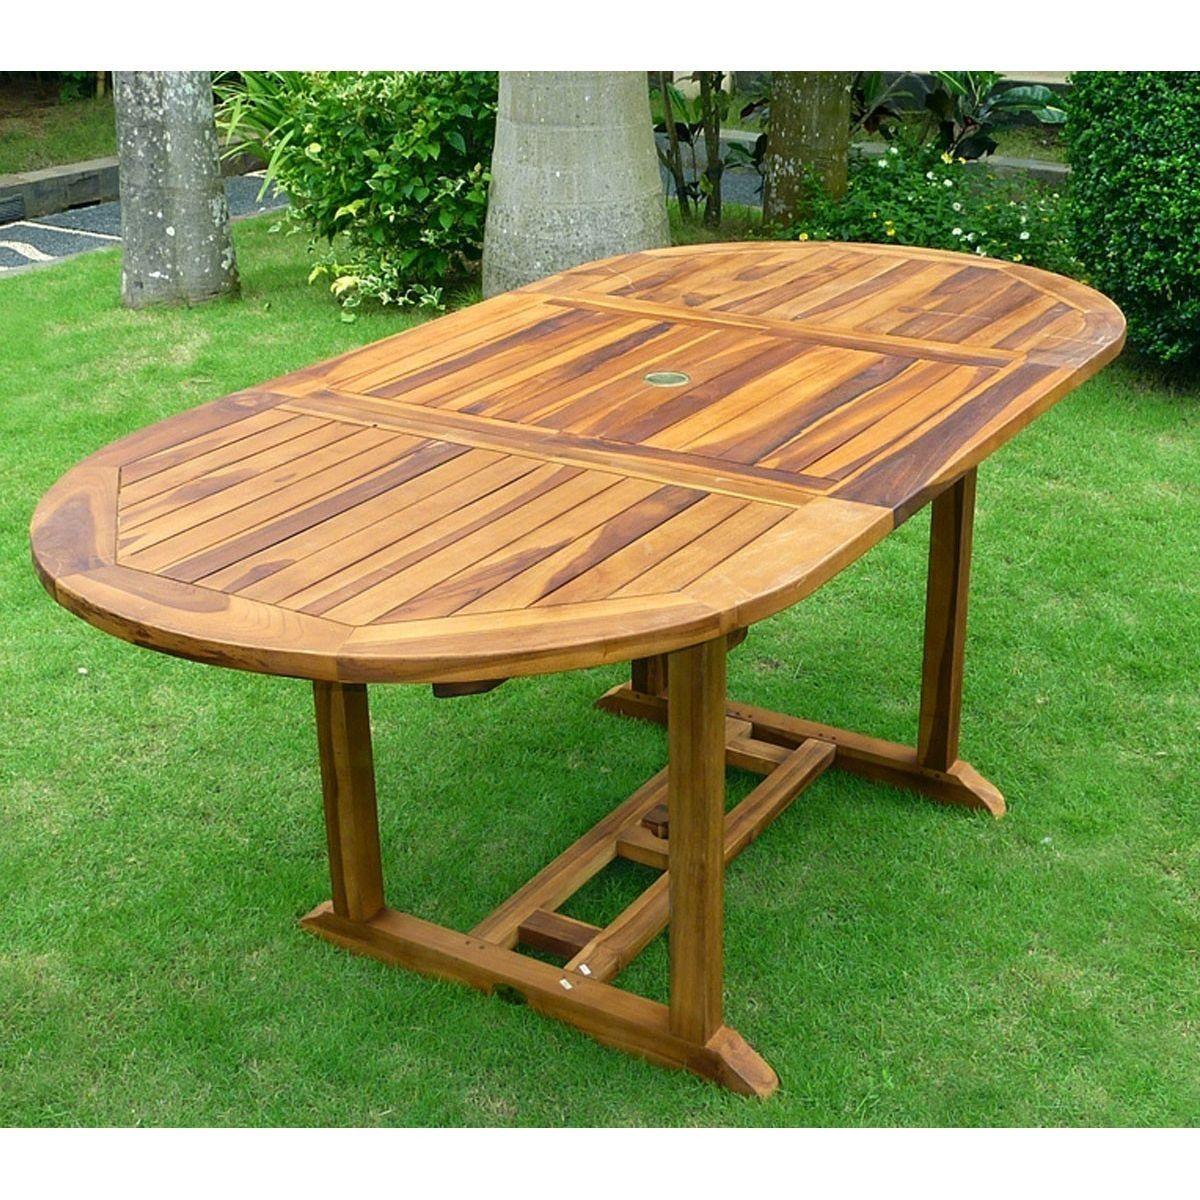 Table Ovale De Jardin En Teck Huilé Avec Rallonge Papillon ...